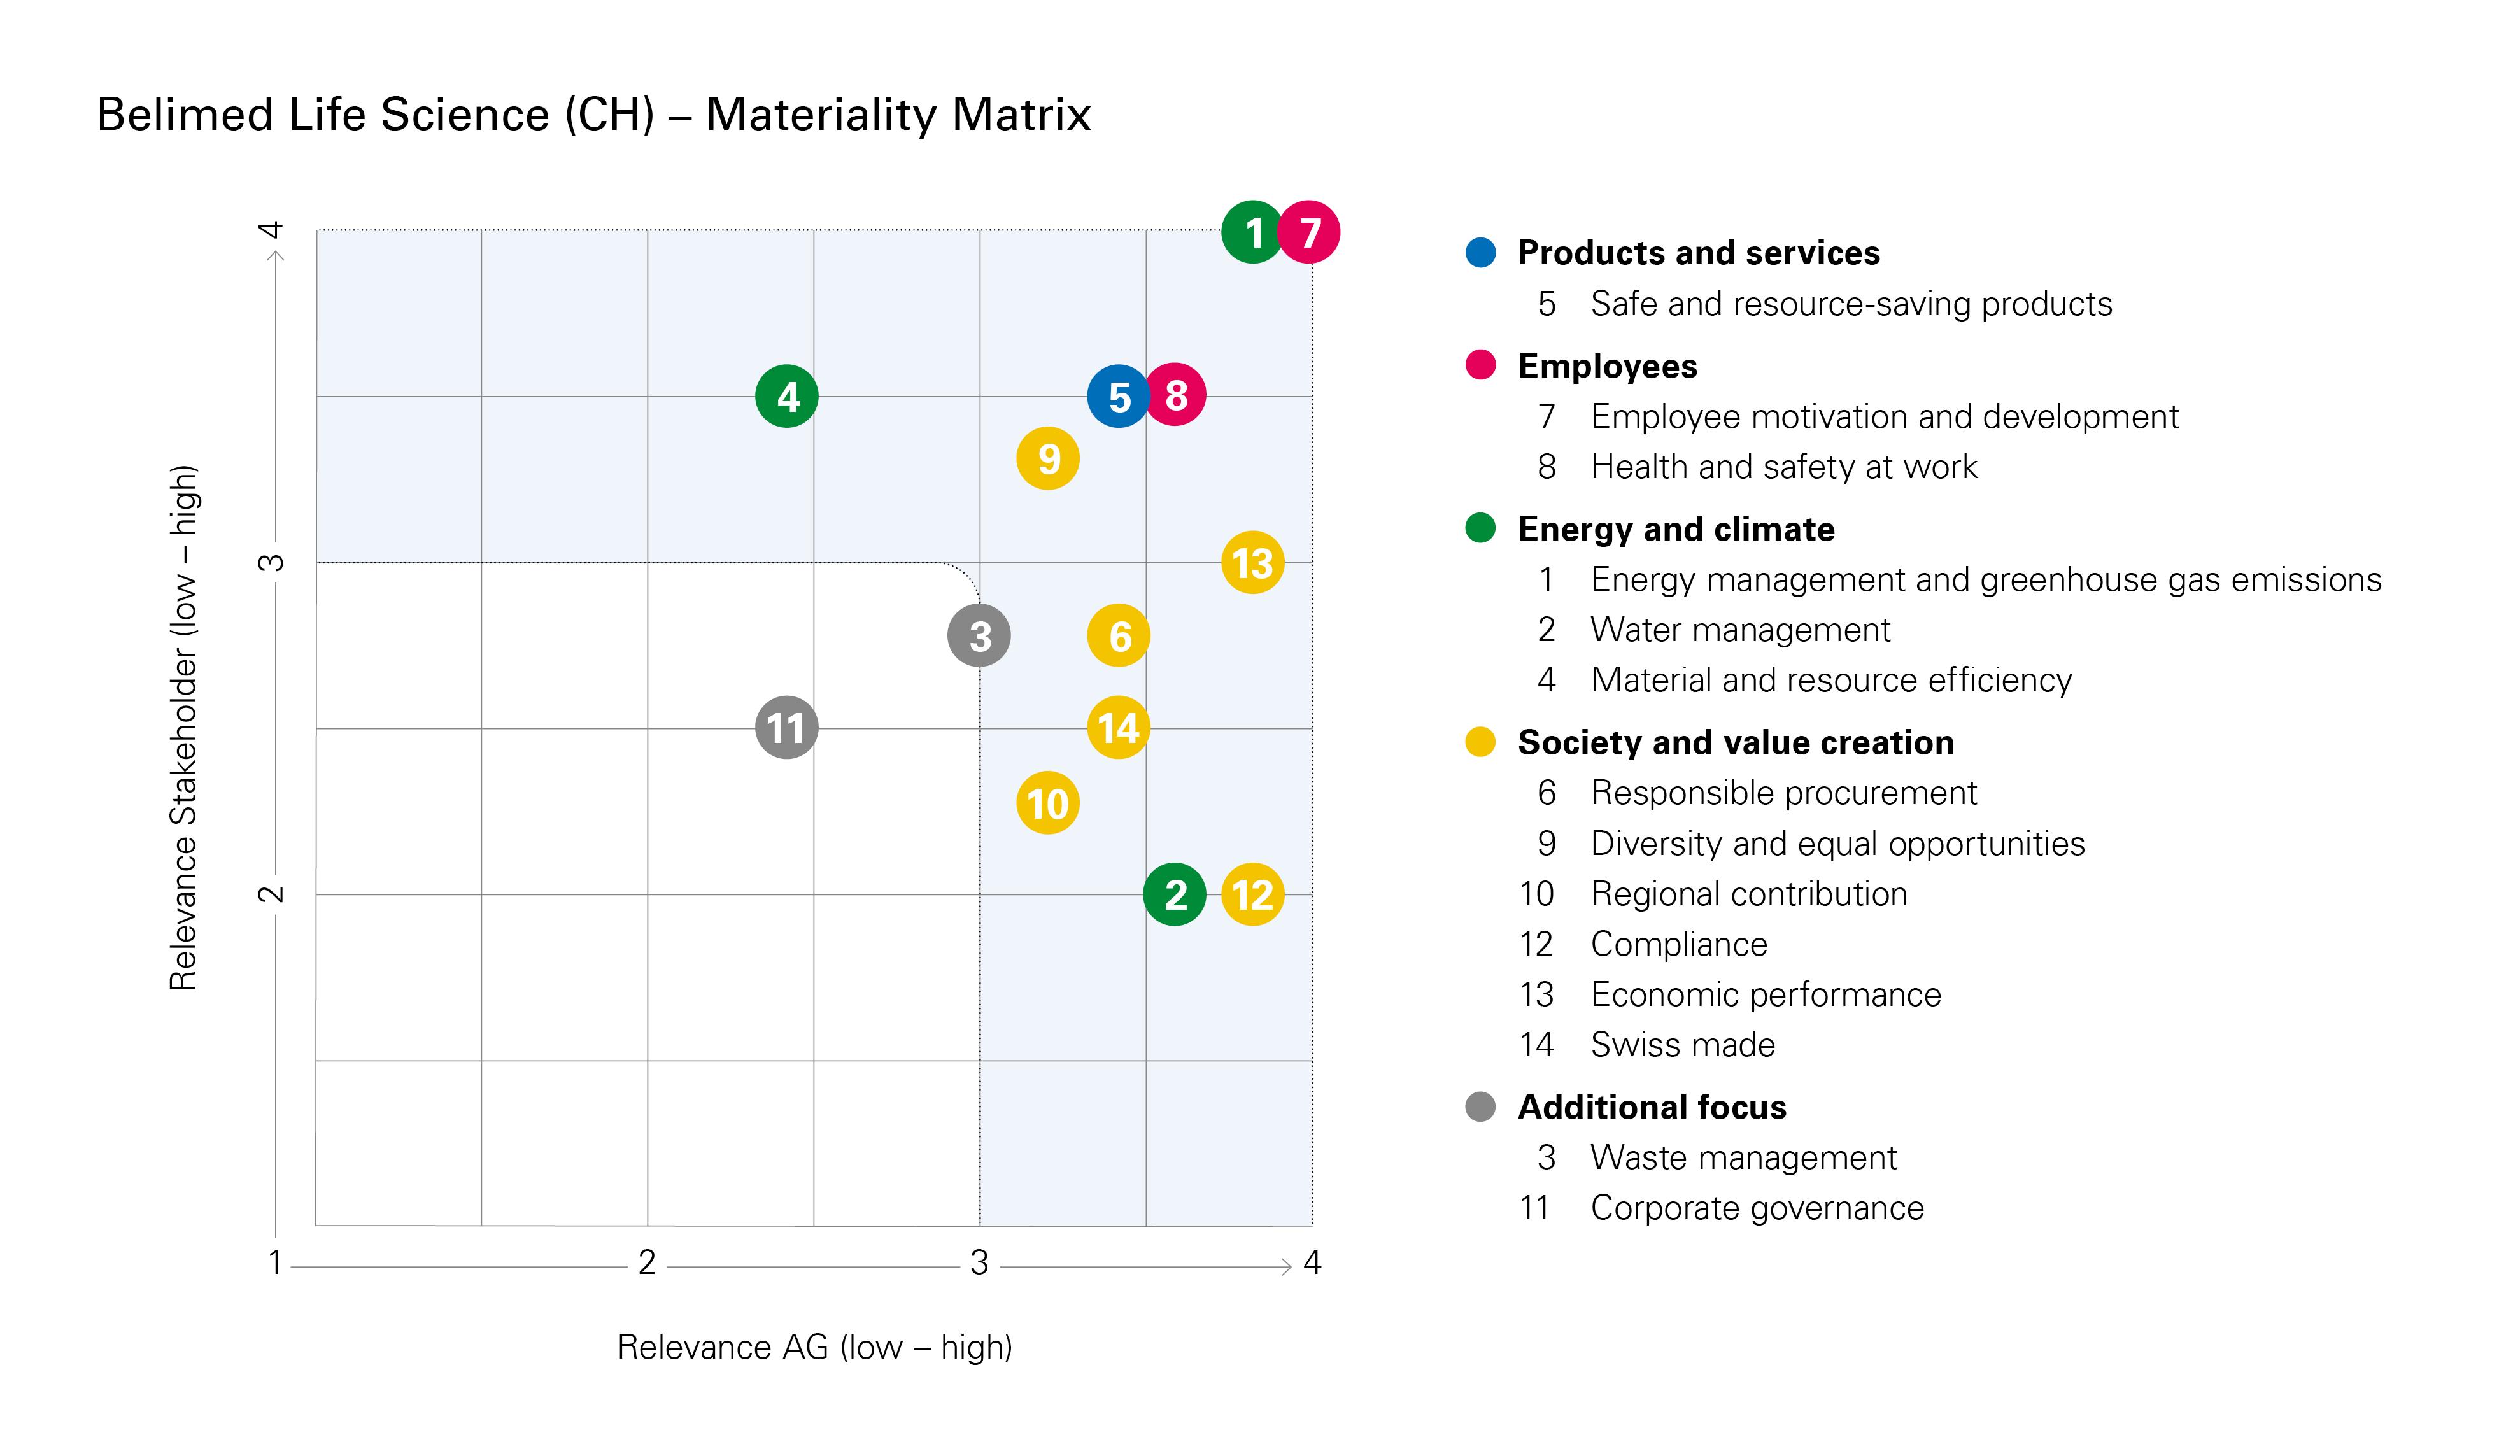 MZ_GB19_Matrix-Belimed-Life-Science-AG_EN_300